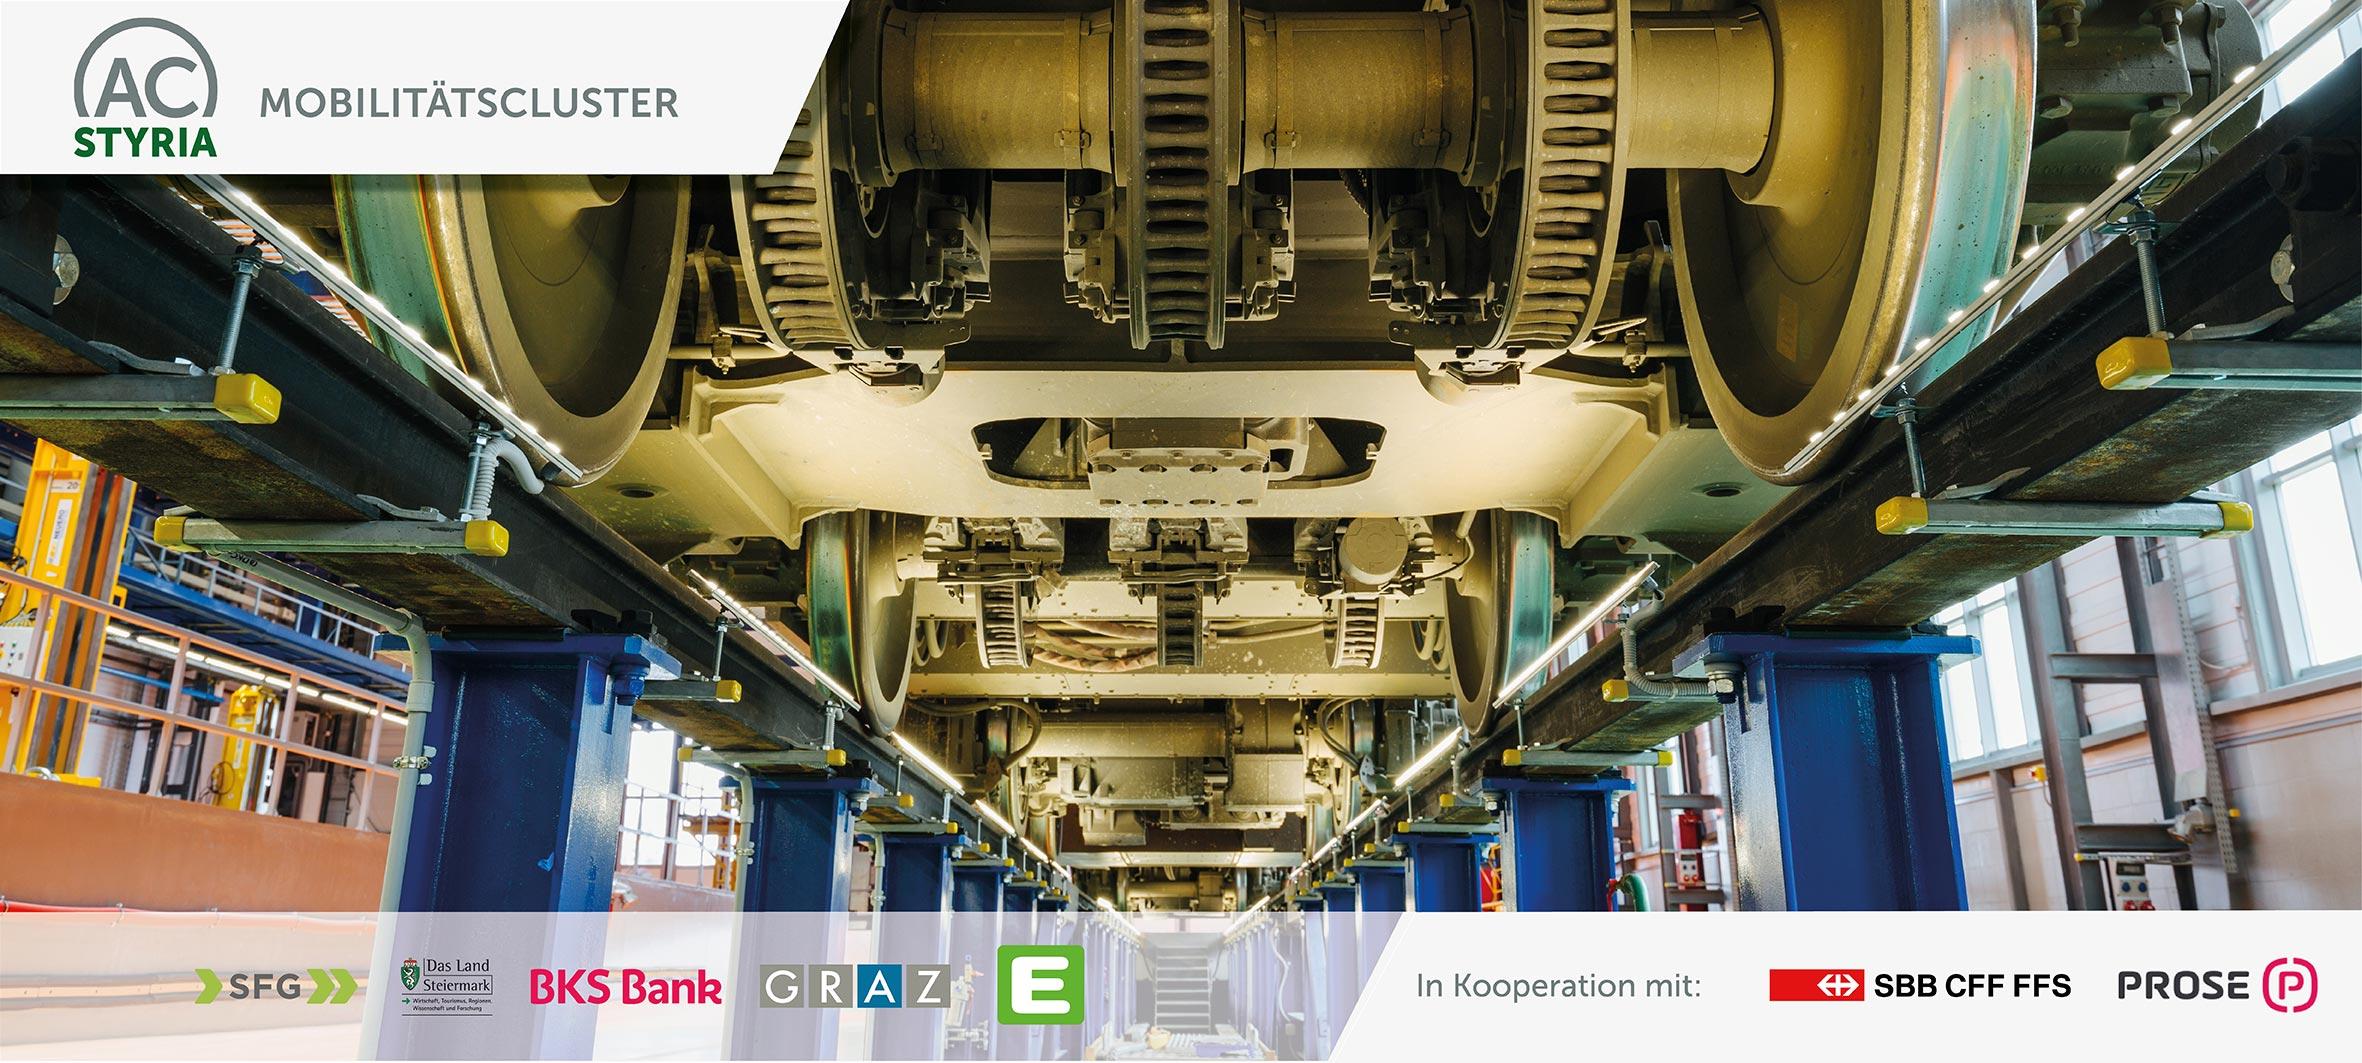 ACstyria Technologiemeeting Rail Systems: ECM – Chancen für Bahn-Zulieferer